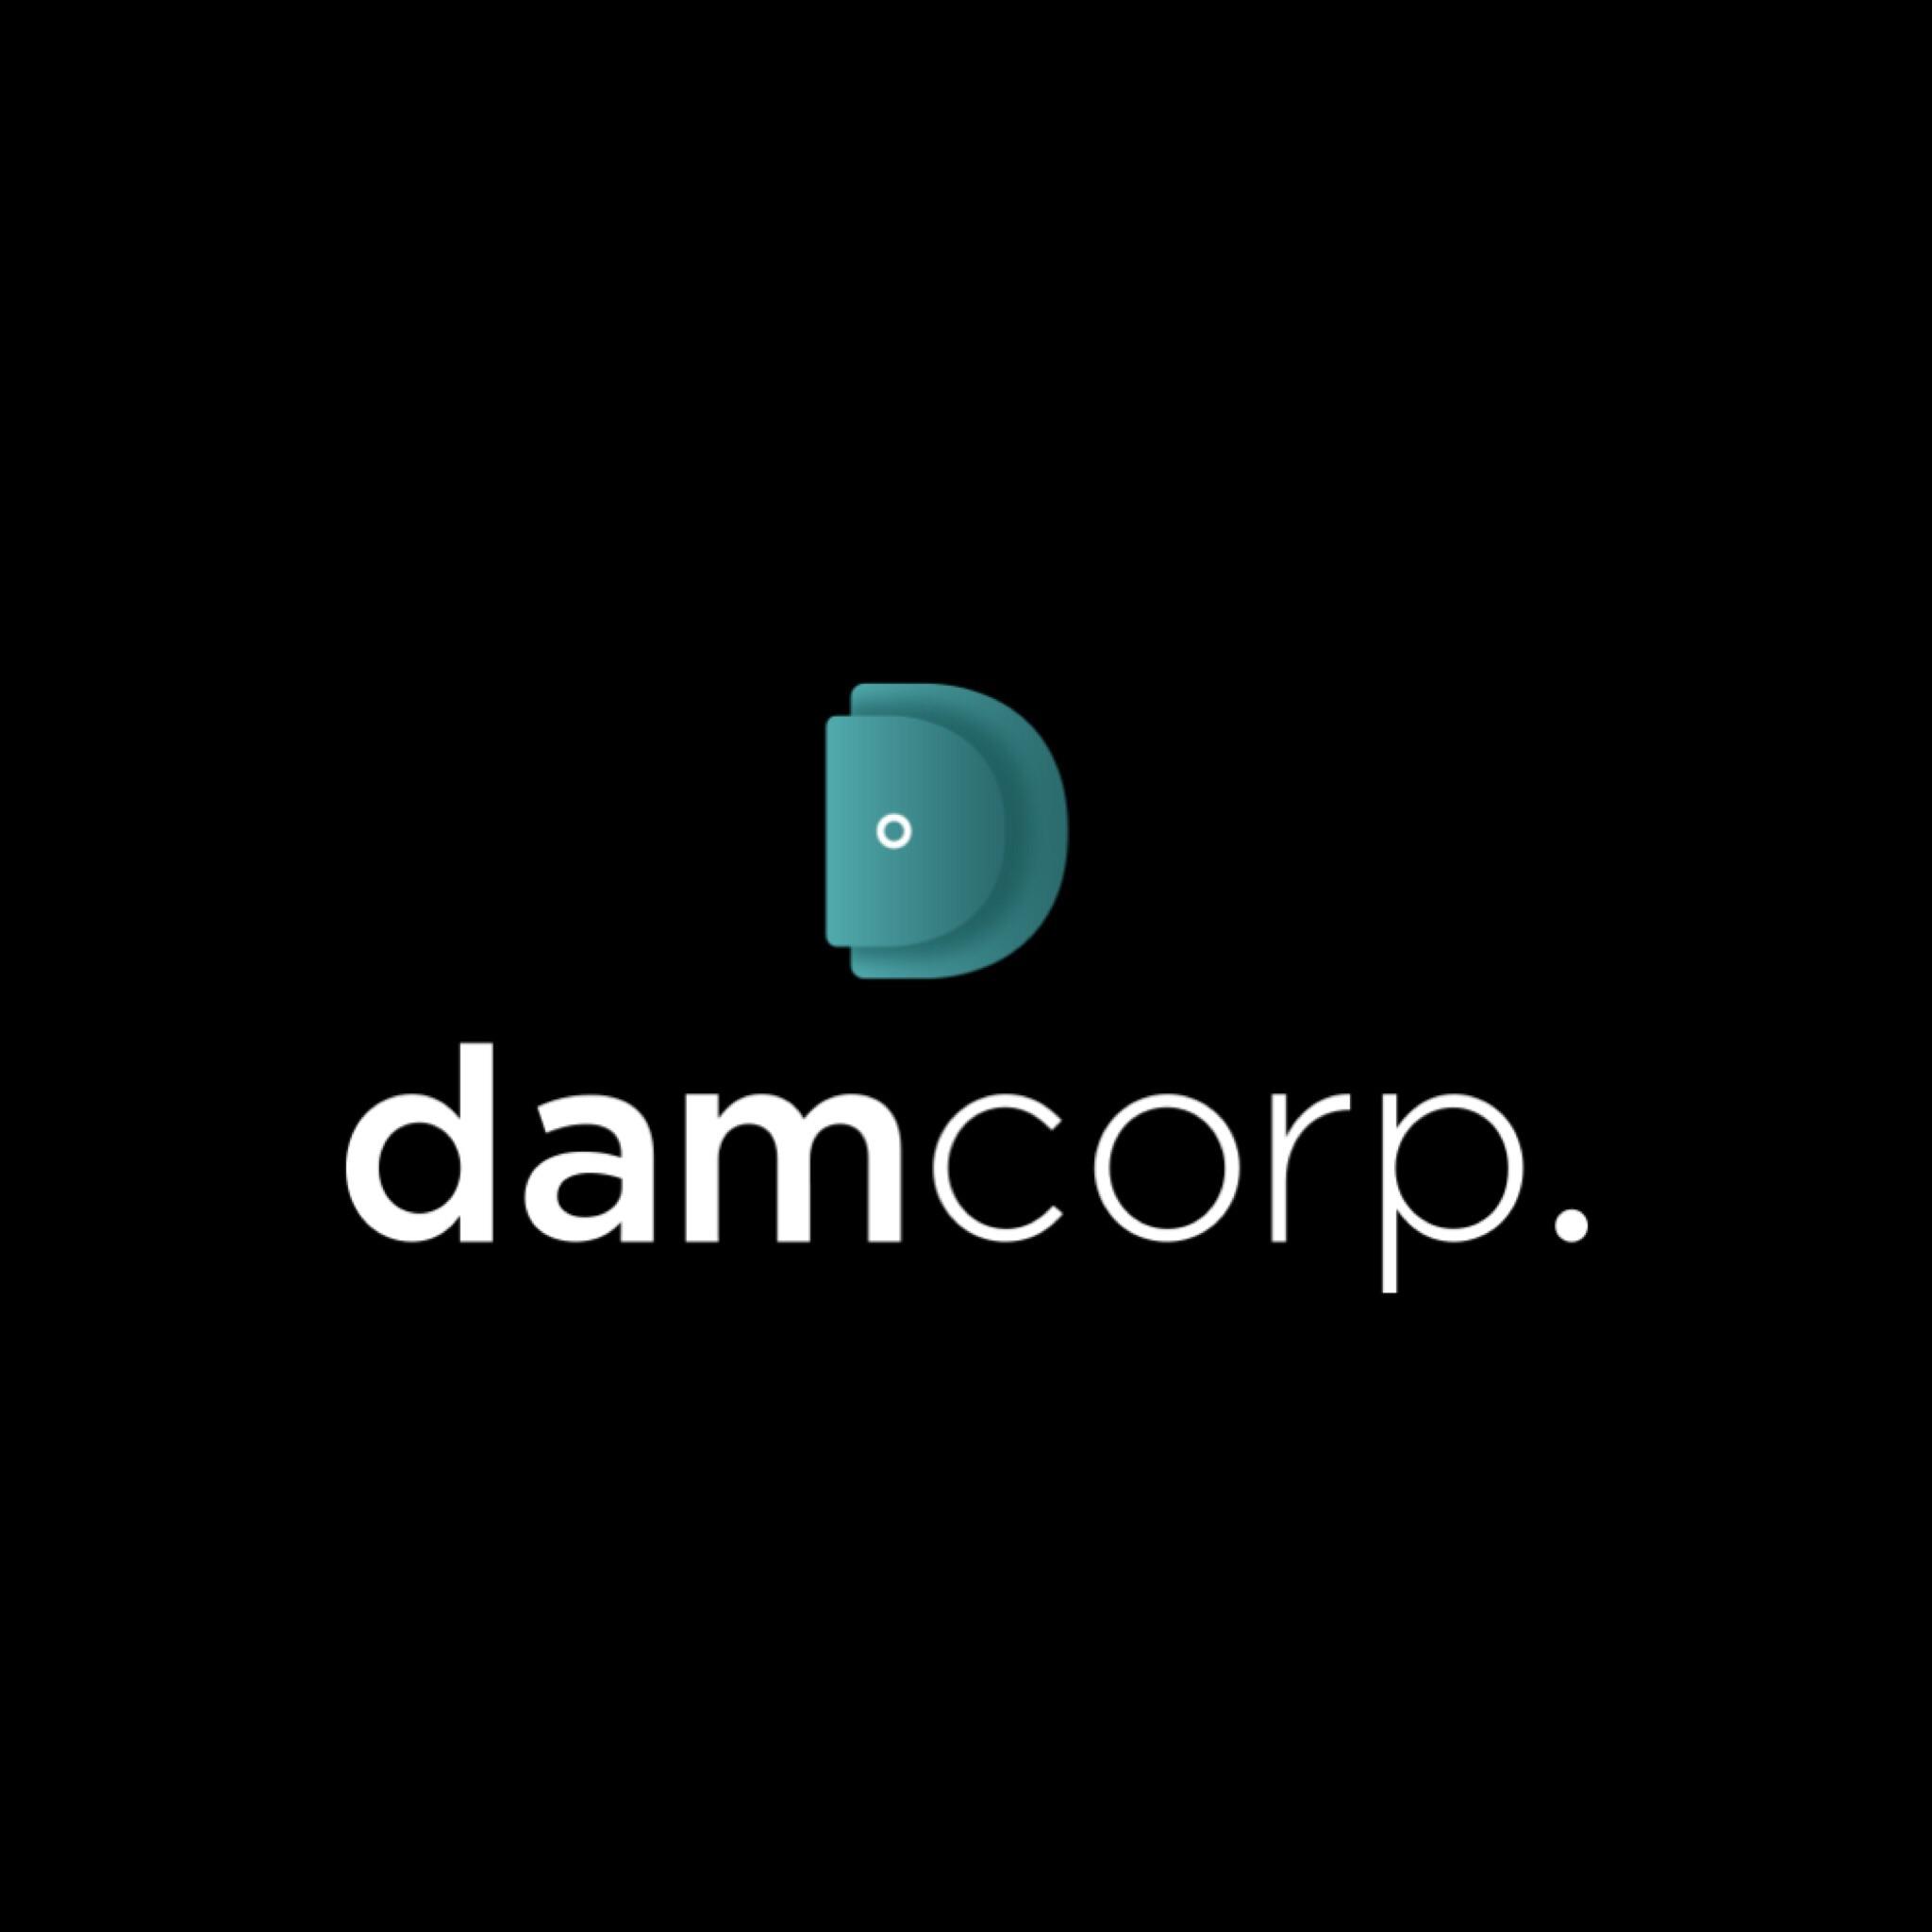 DAM Corp. company logo